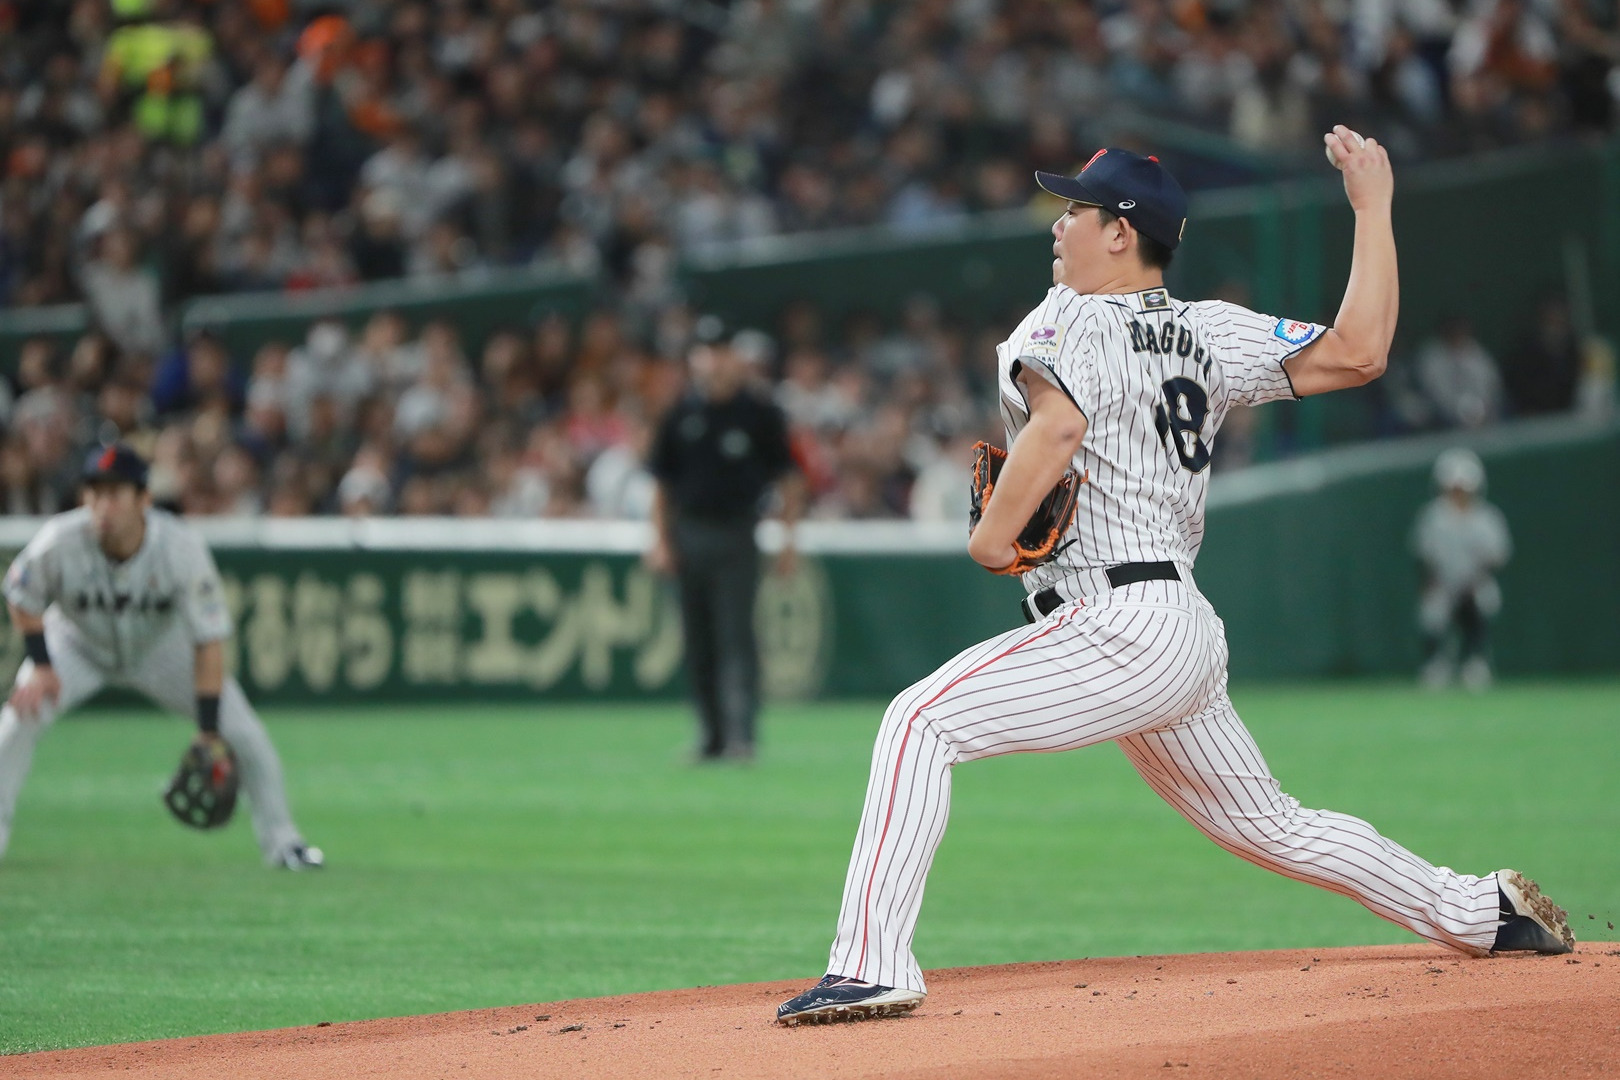 Japan's starter Yamaguchi Shuto lasted one inning